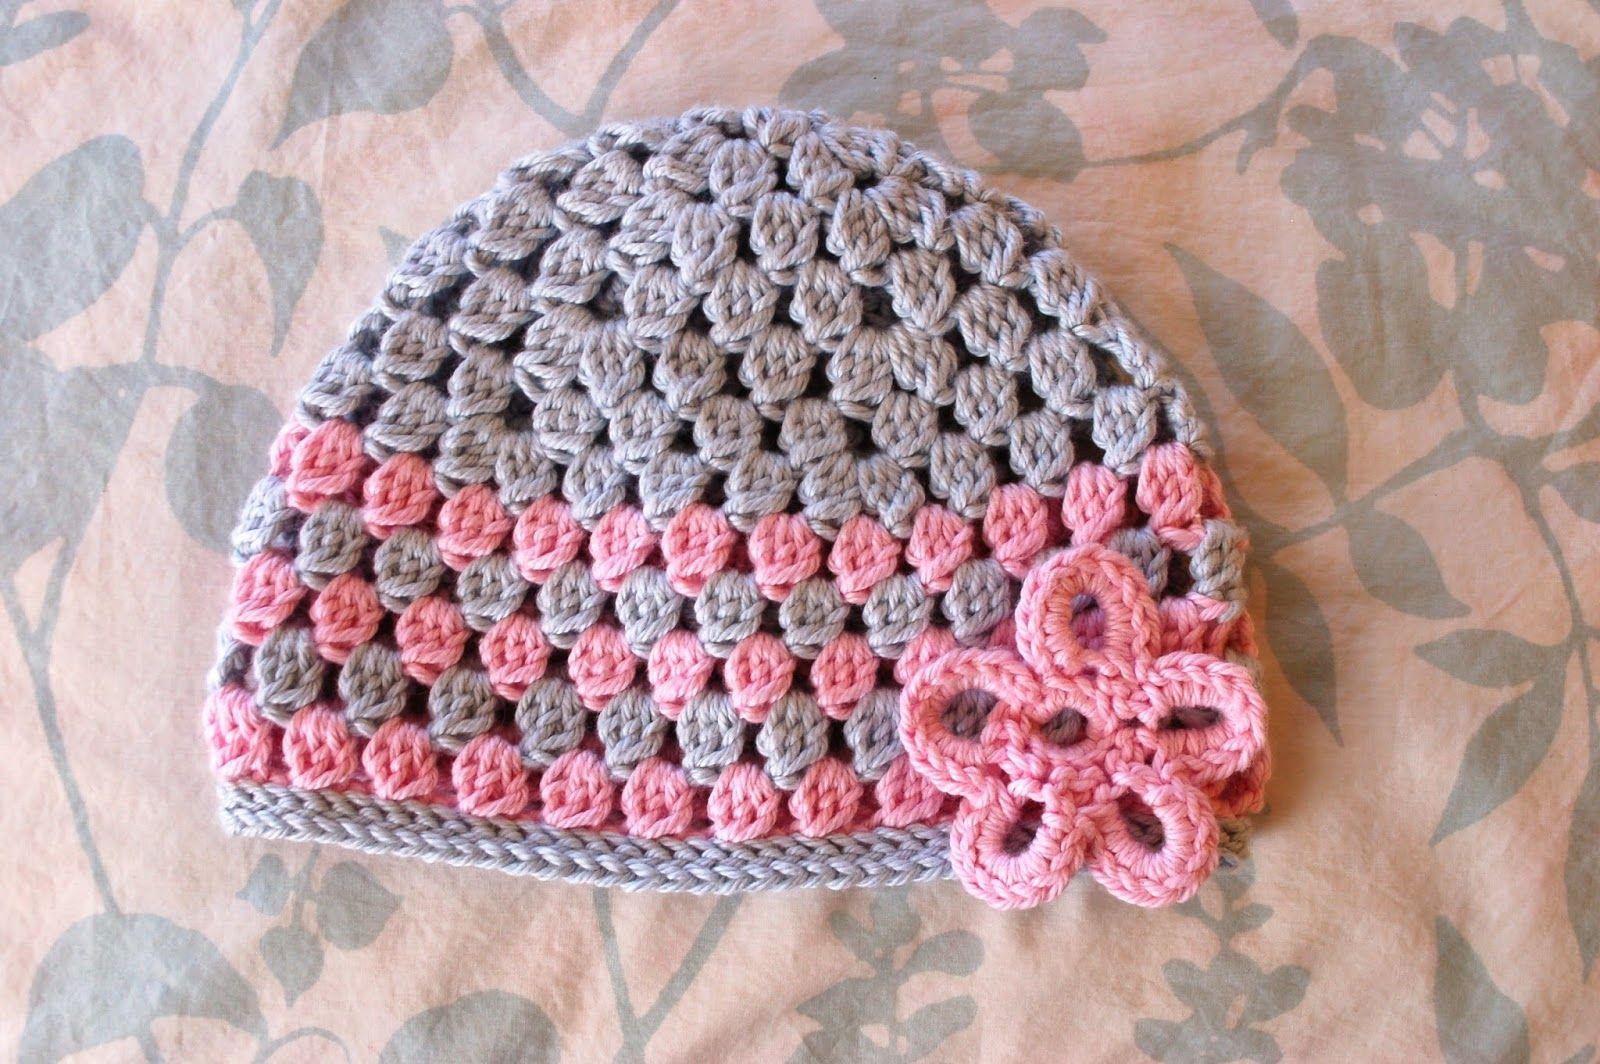 Alli crafts free pattern cluster hat 9 12 months teresa alli crafts free pattern cluster hat 9 12 months baby crochet bankloansurffo Gallery